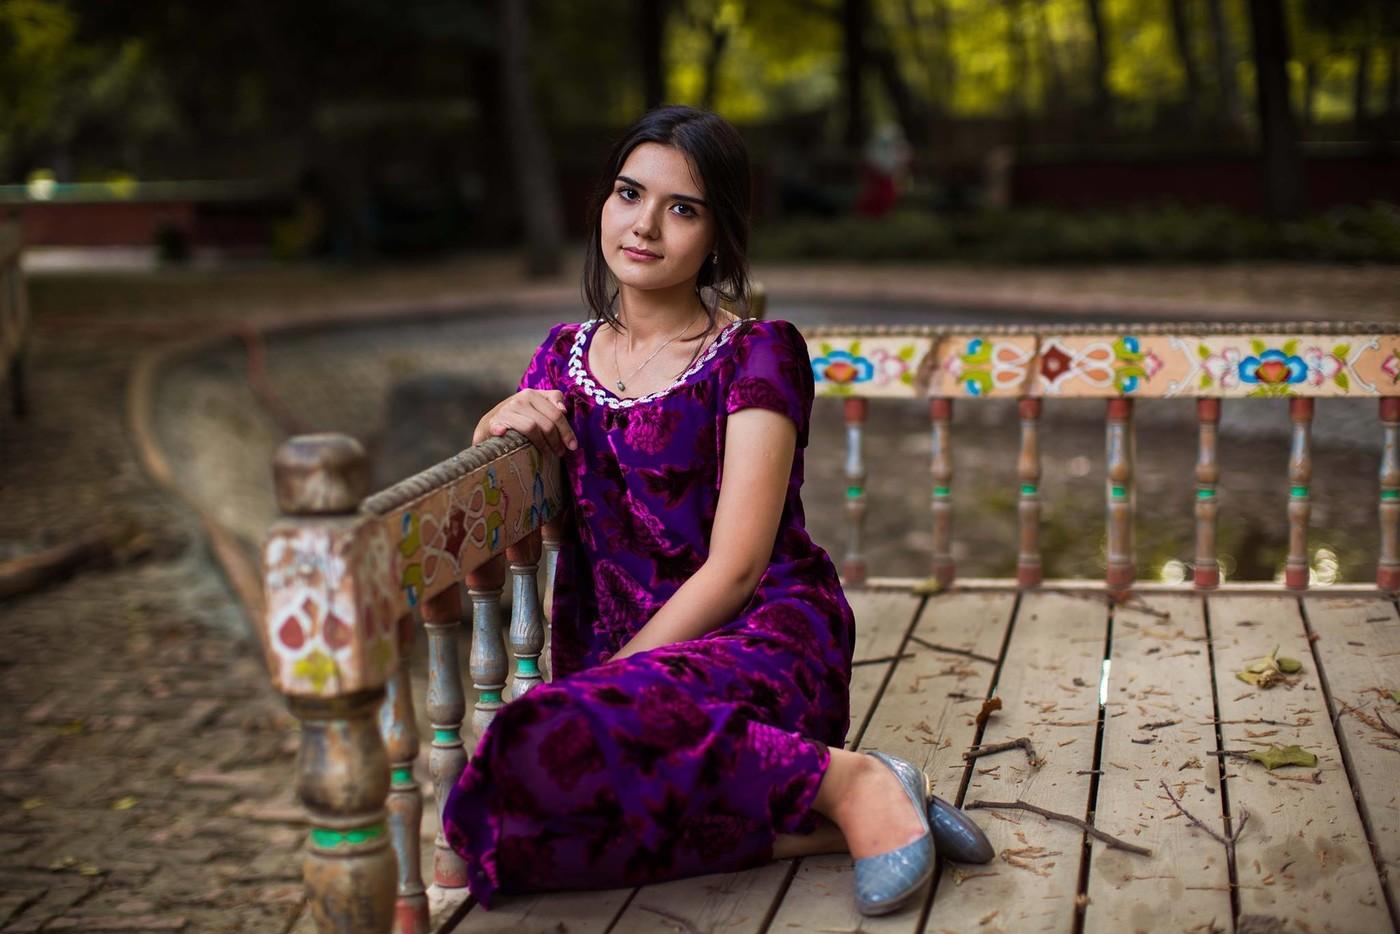 Таджикские девушки видео — 10